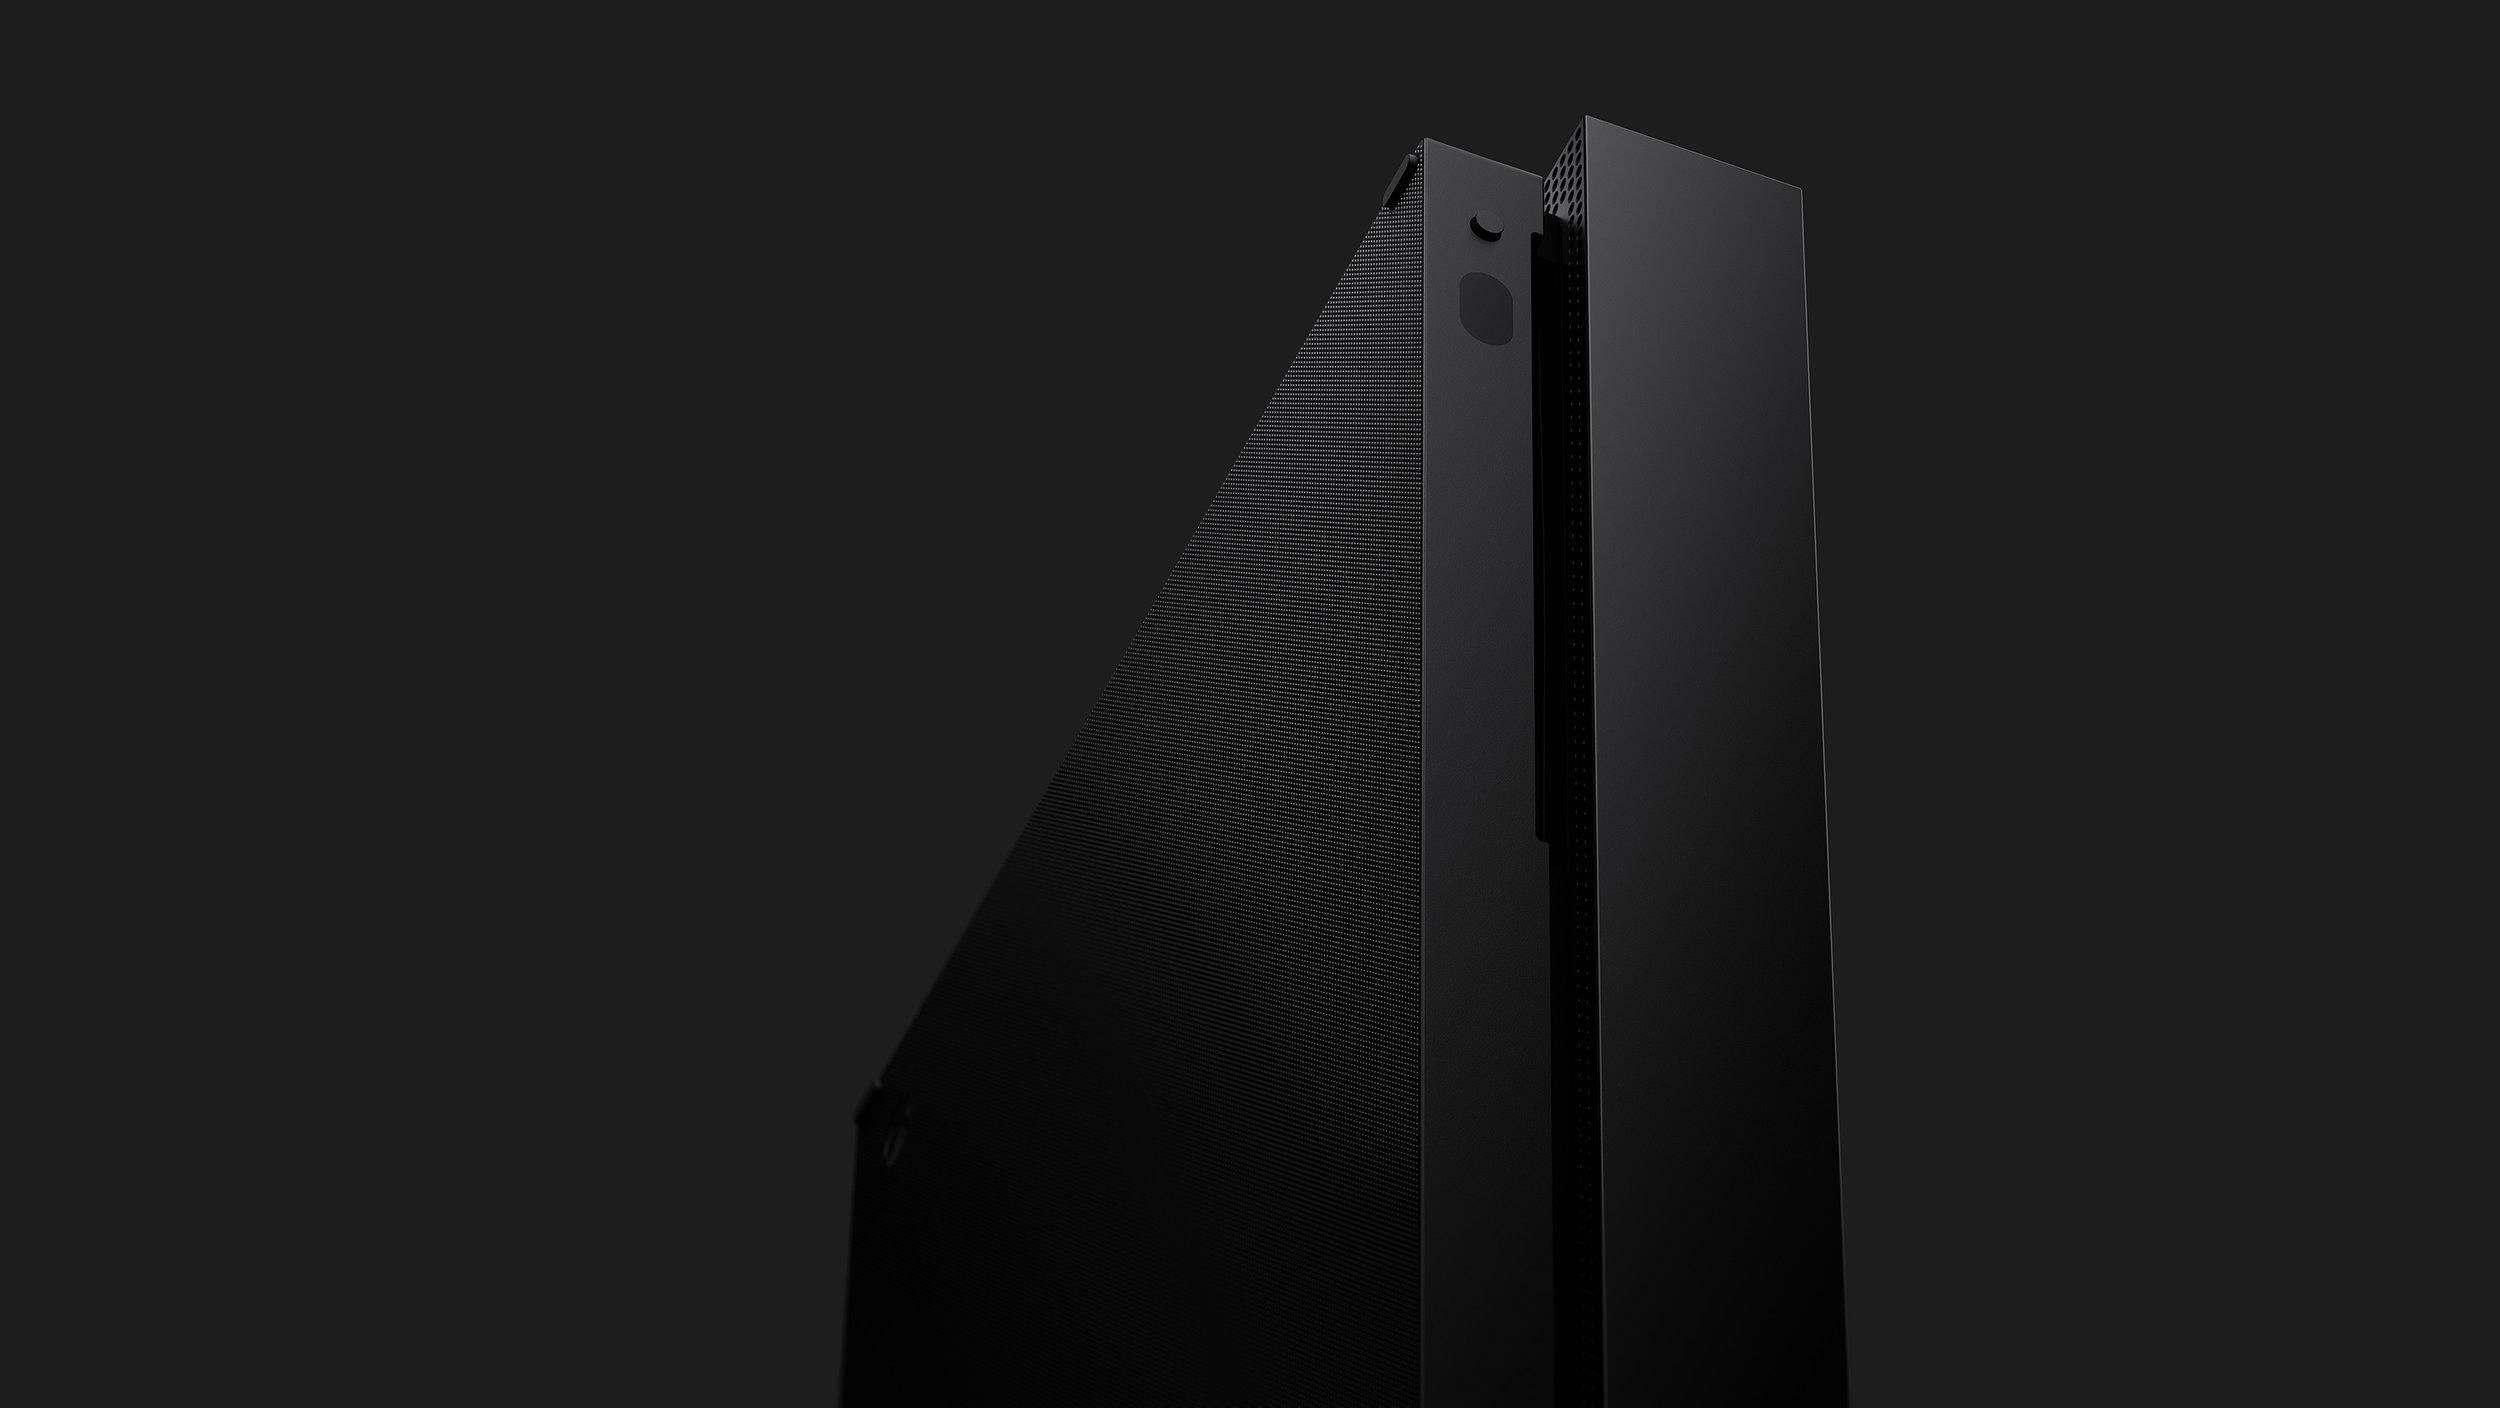 XboxOneX_Detail_006.jpg